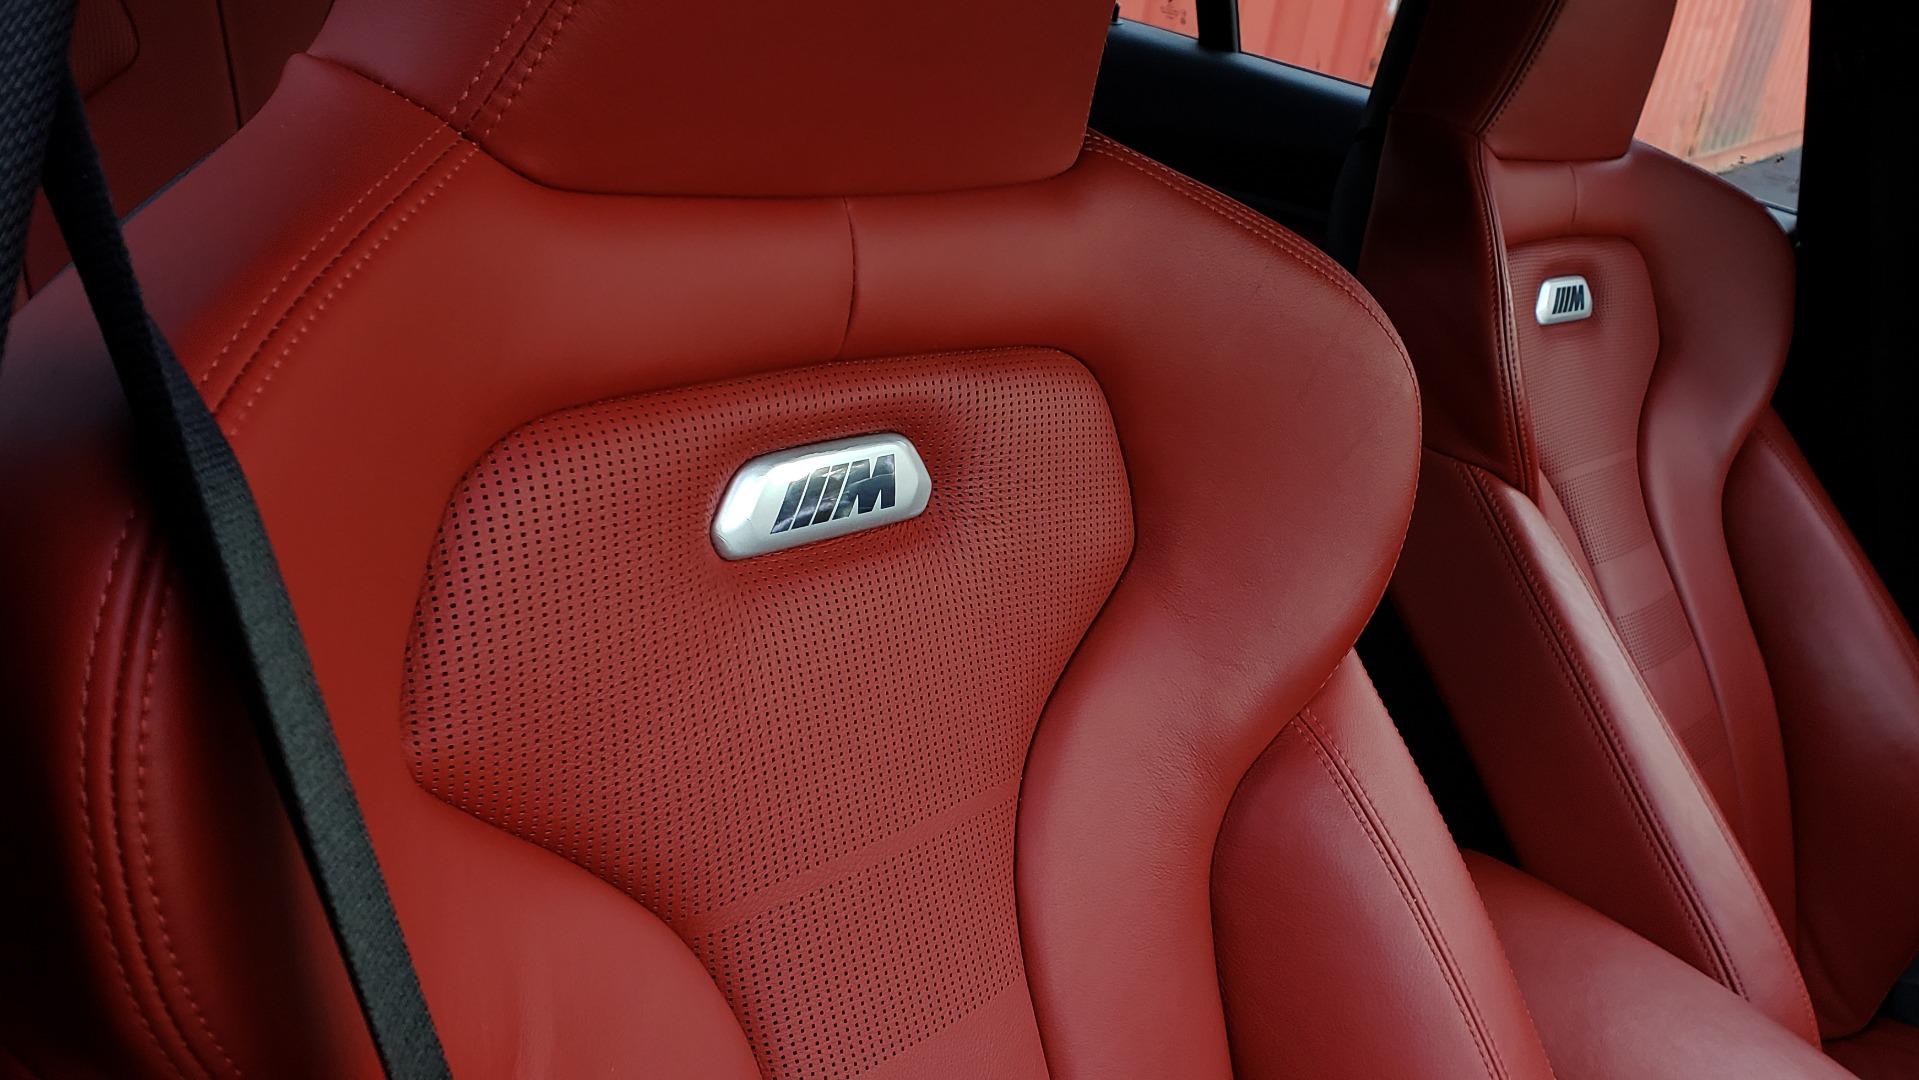 Used 2015 BMW M3 EXECUTIVE PKG / NAV / CAMERA / HUD / CARBON FIBER ROOF for sale Sold at Formula Imports in Charlotte NC 28227 79